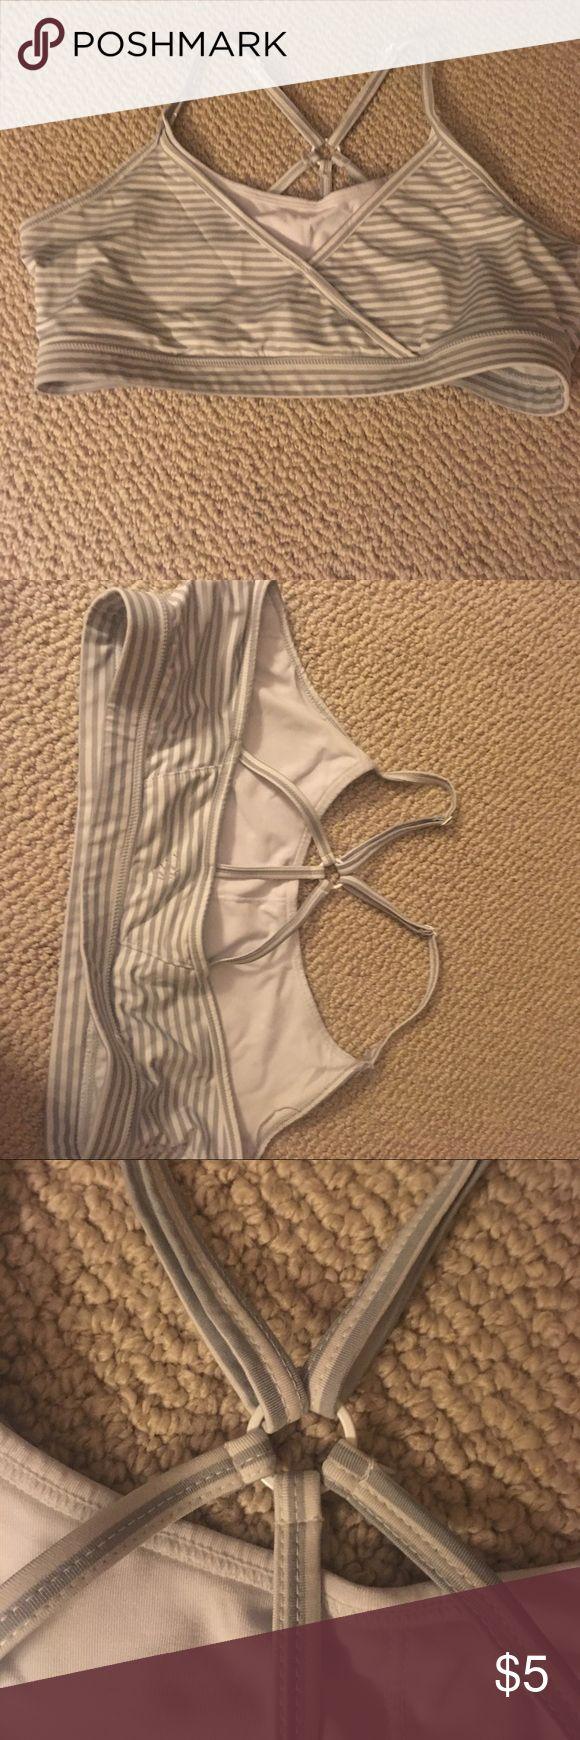 Gray striped sports bra Gray and white striped sports bra. White at top of bra and adjustable straps MPG Intimates & Sleepwear Bras